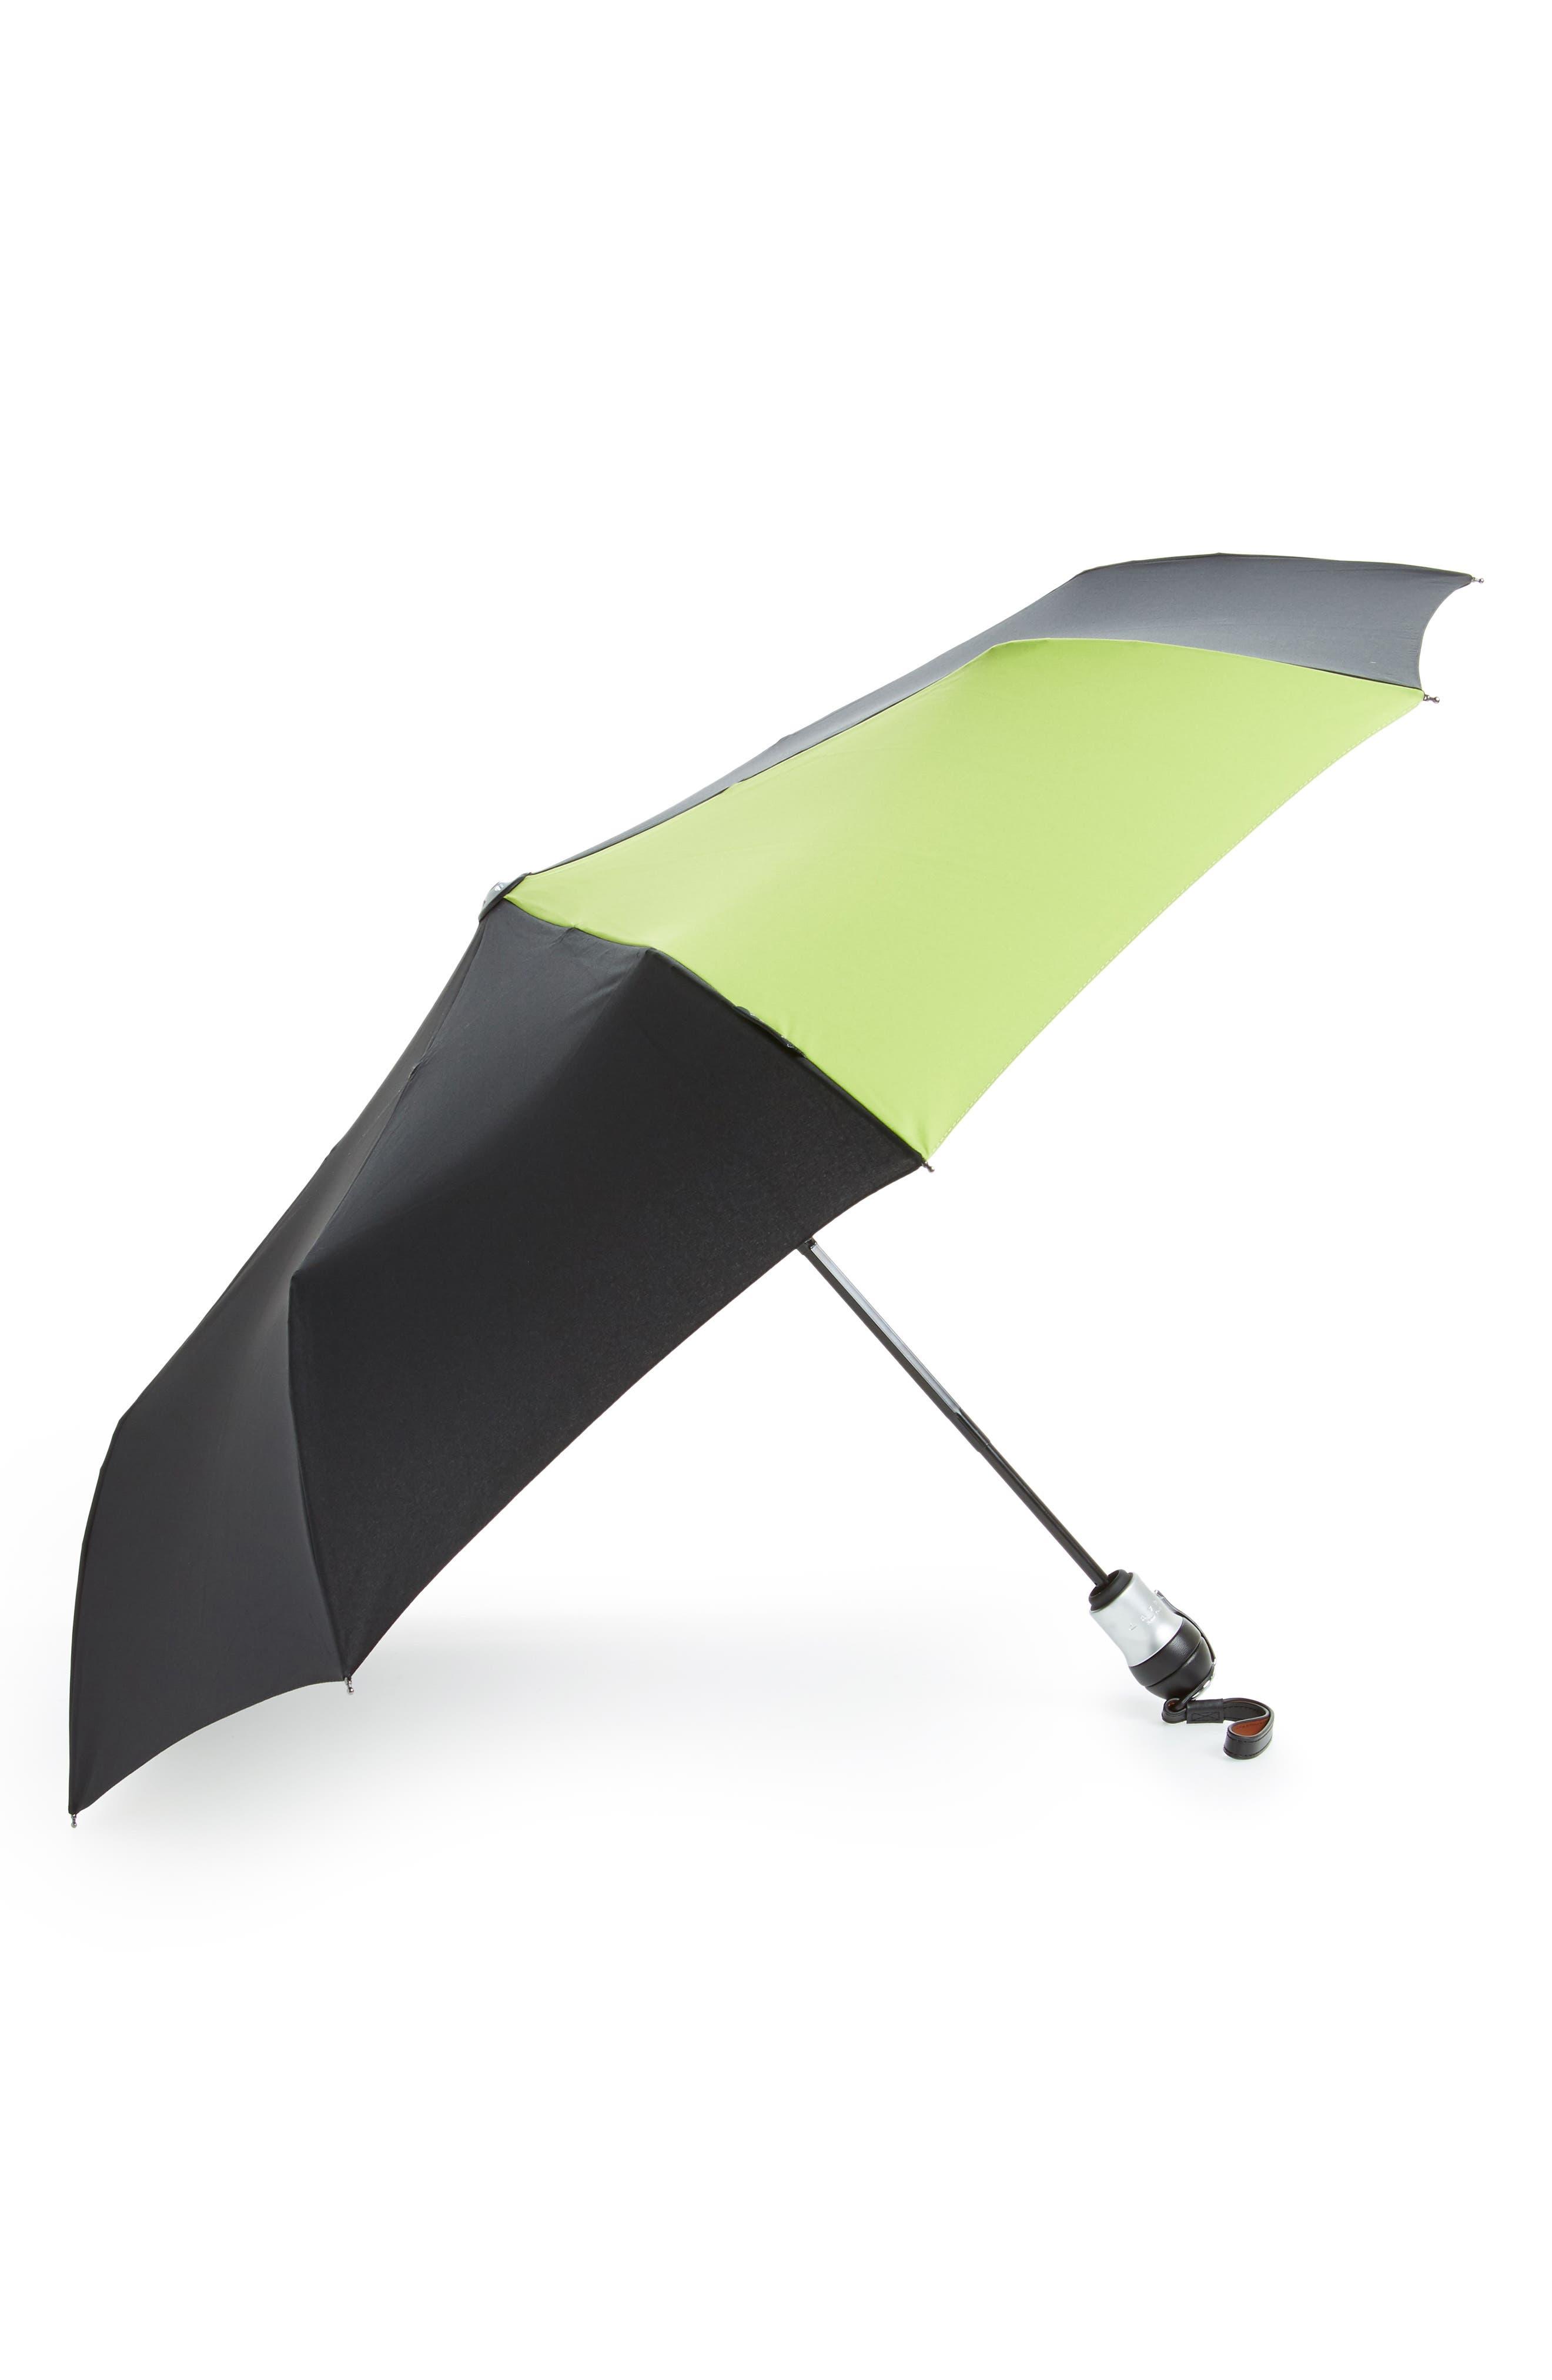 Solo Medium Umbrella,                         Main,                         color, Black/ Wasabi Green